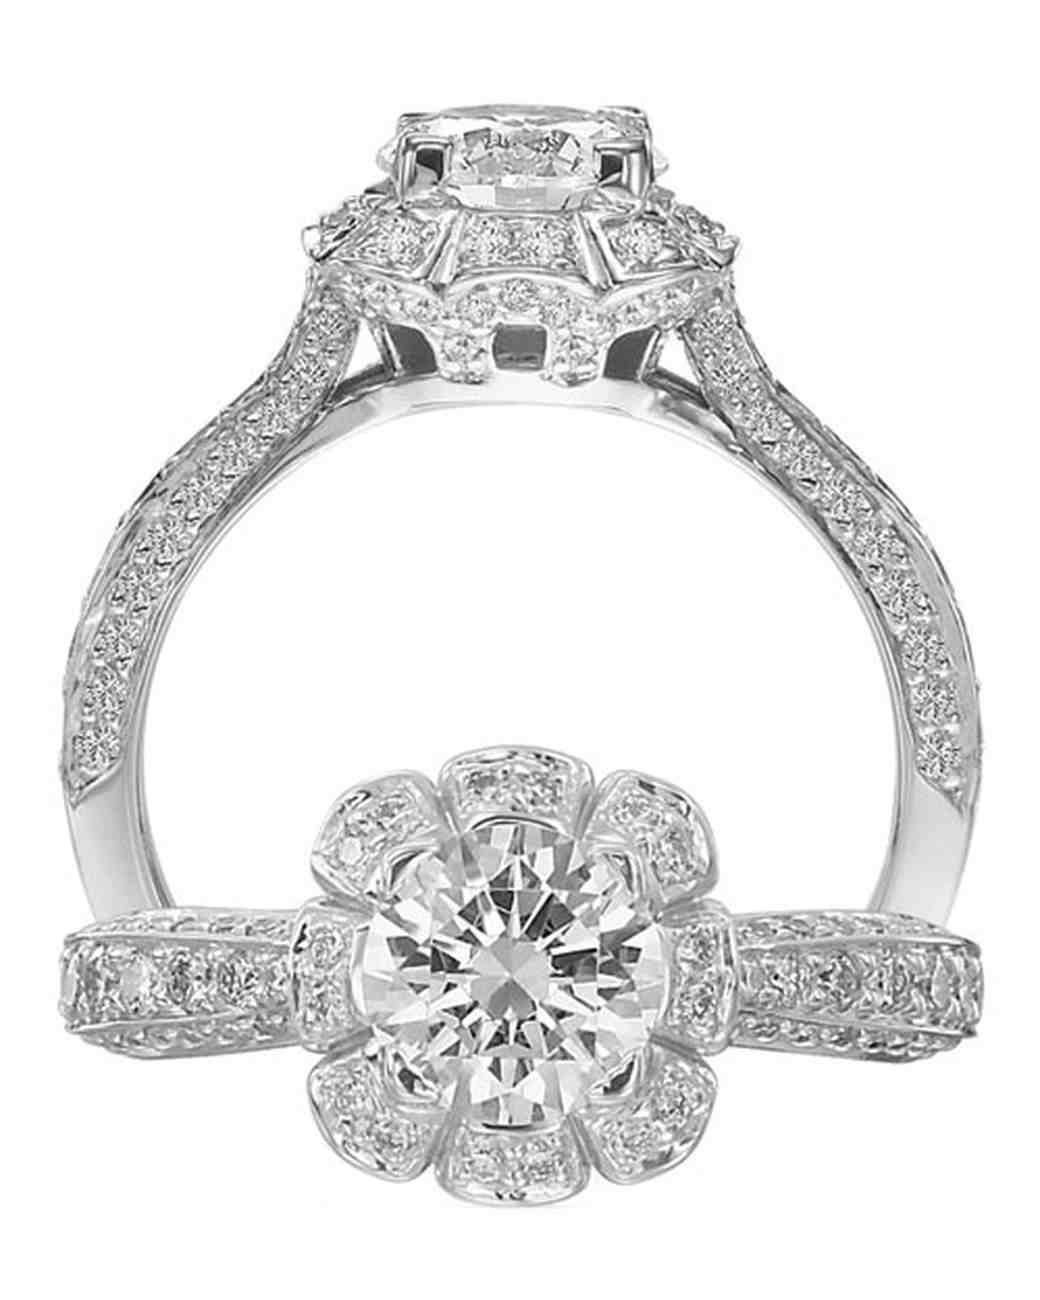 Ritani White Gold Floral Engagement Ring